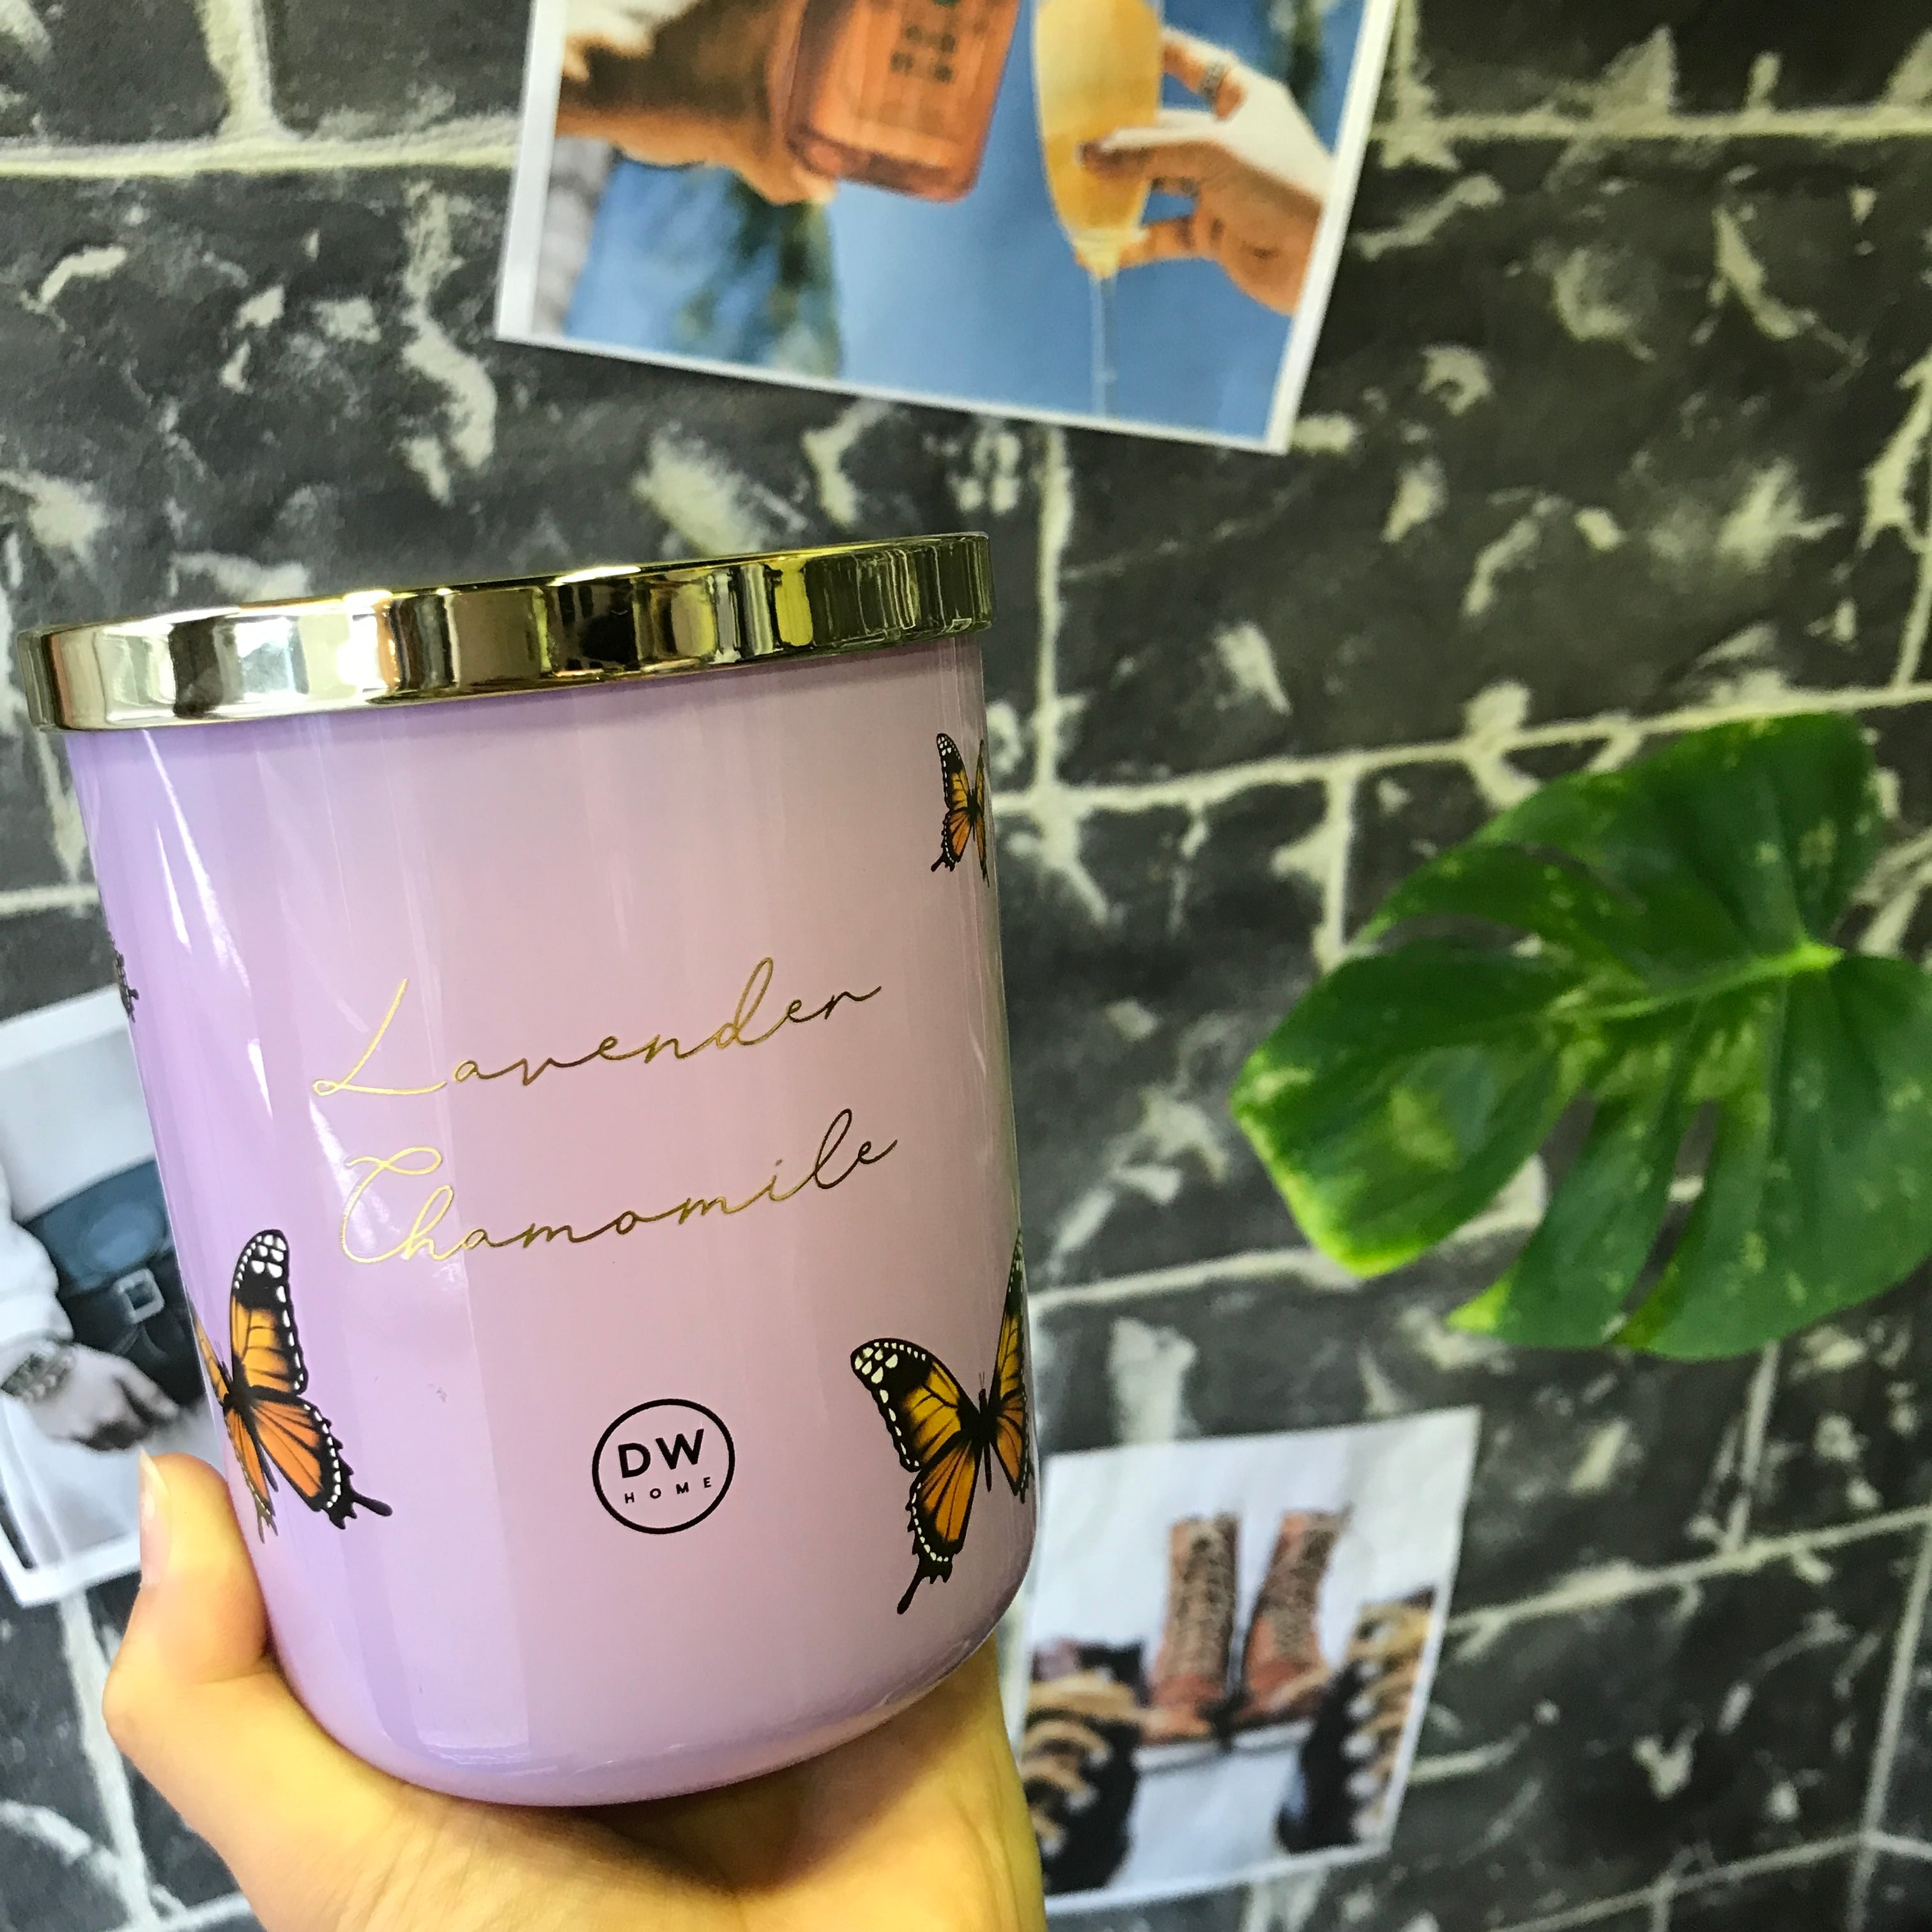 【DW Home Candles】LAVENDER & CHAMOMILE【アロマキャンドル】